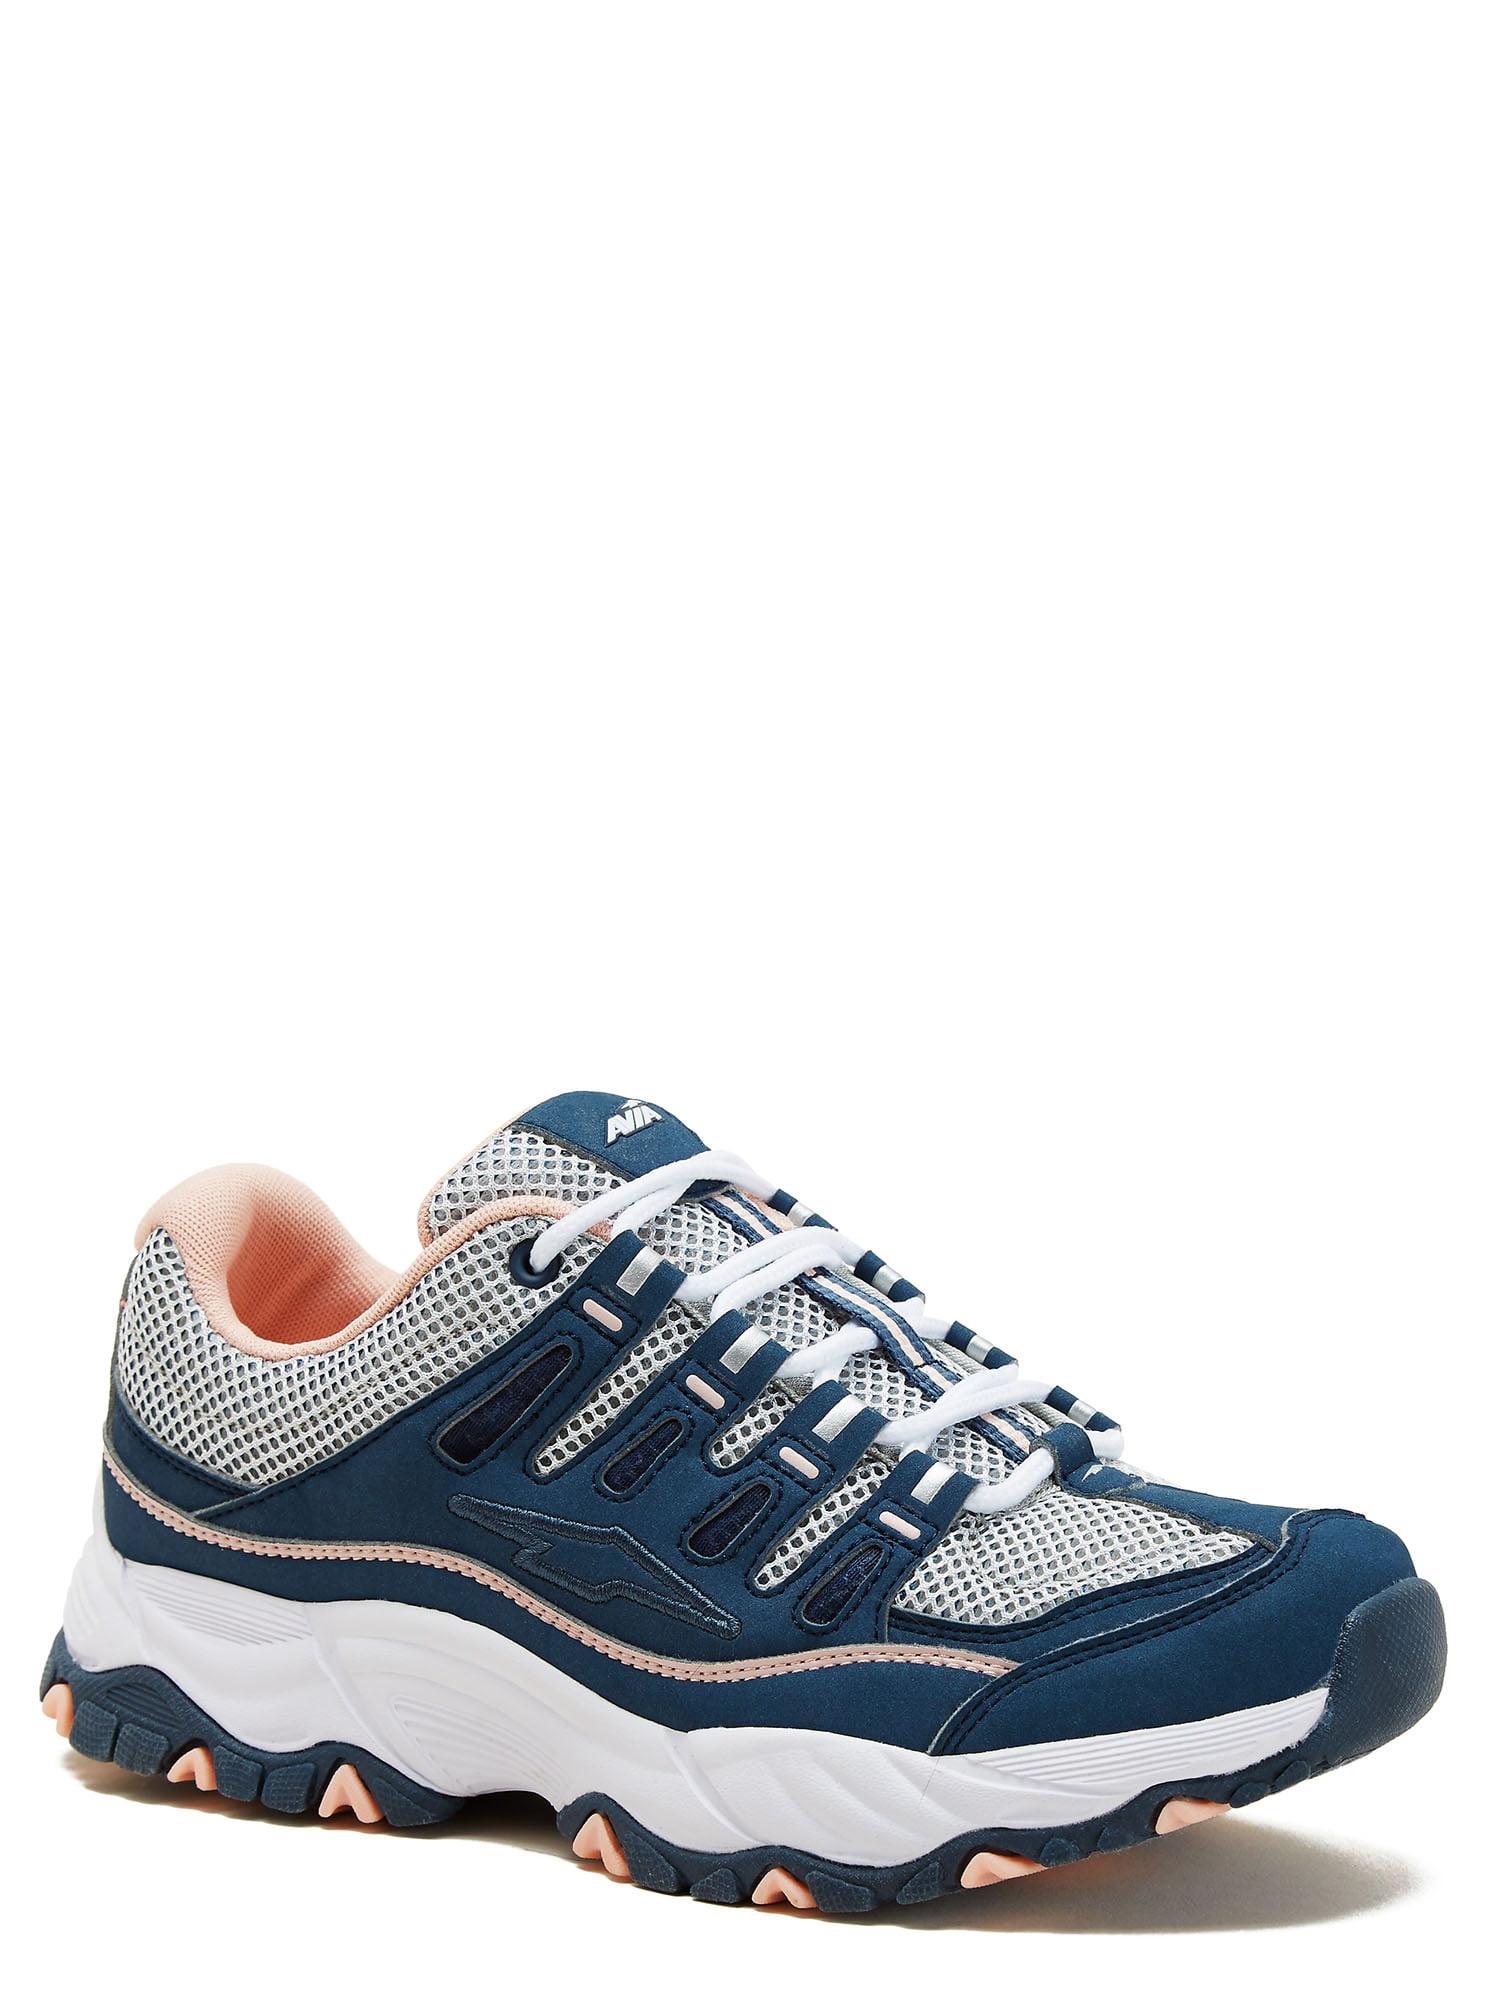 Avia Womens Sneakers \u0026 Athletic